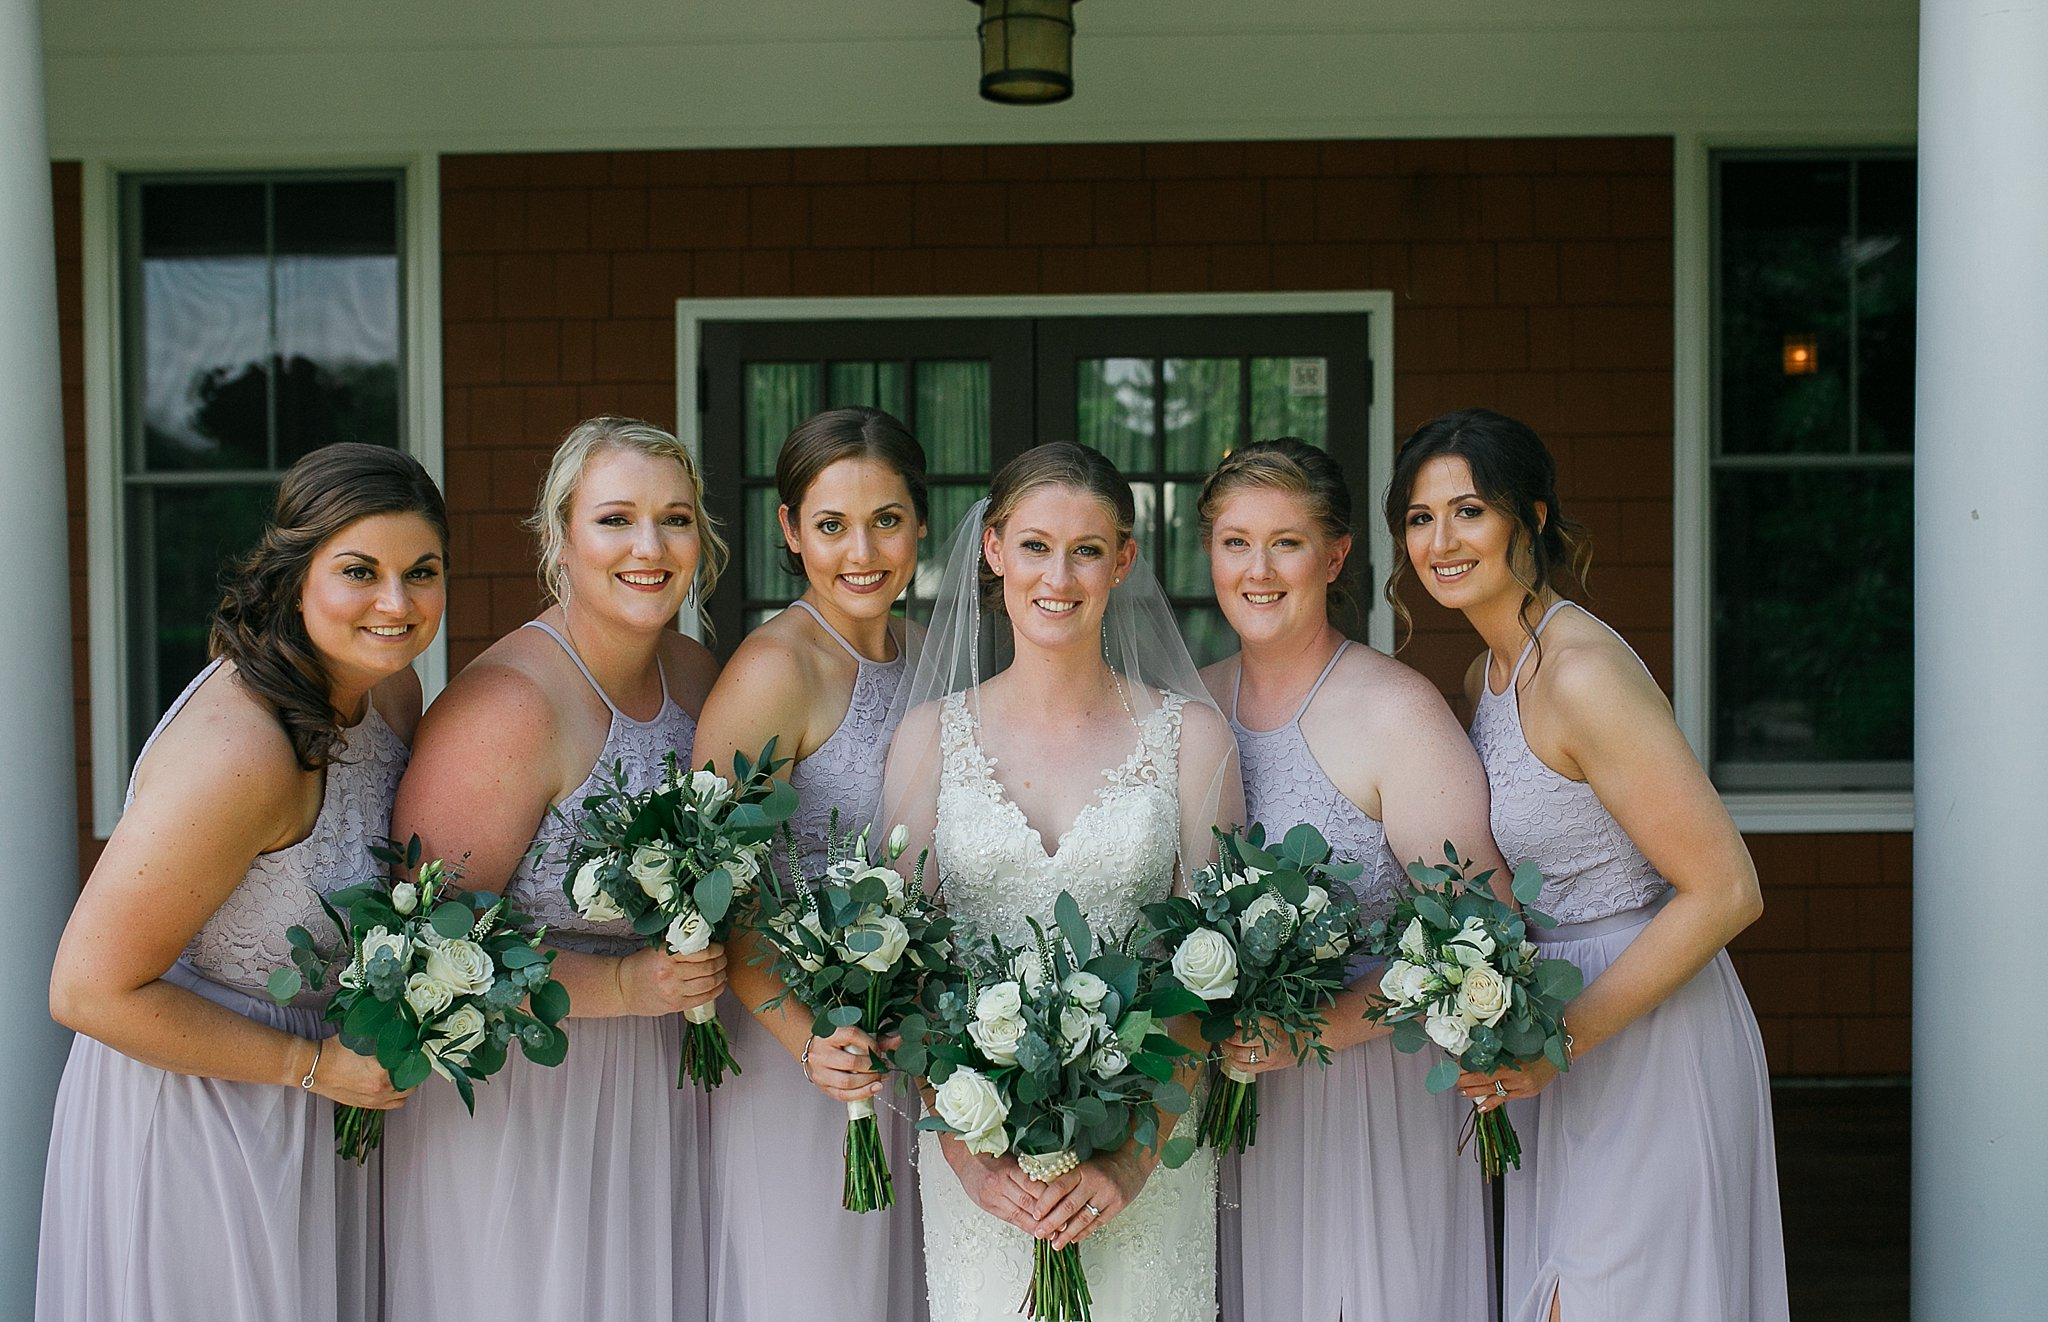 Hollow Brook Golf Club Cortlandt Manor NY Wedding Sweet Alice Photography June Wedding39.jpg